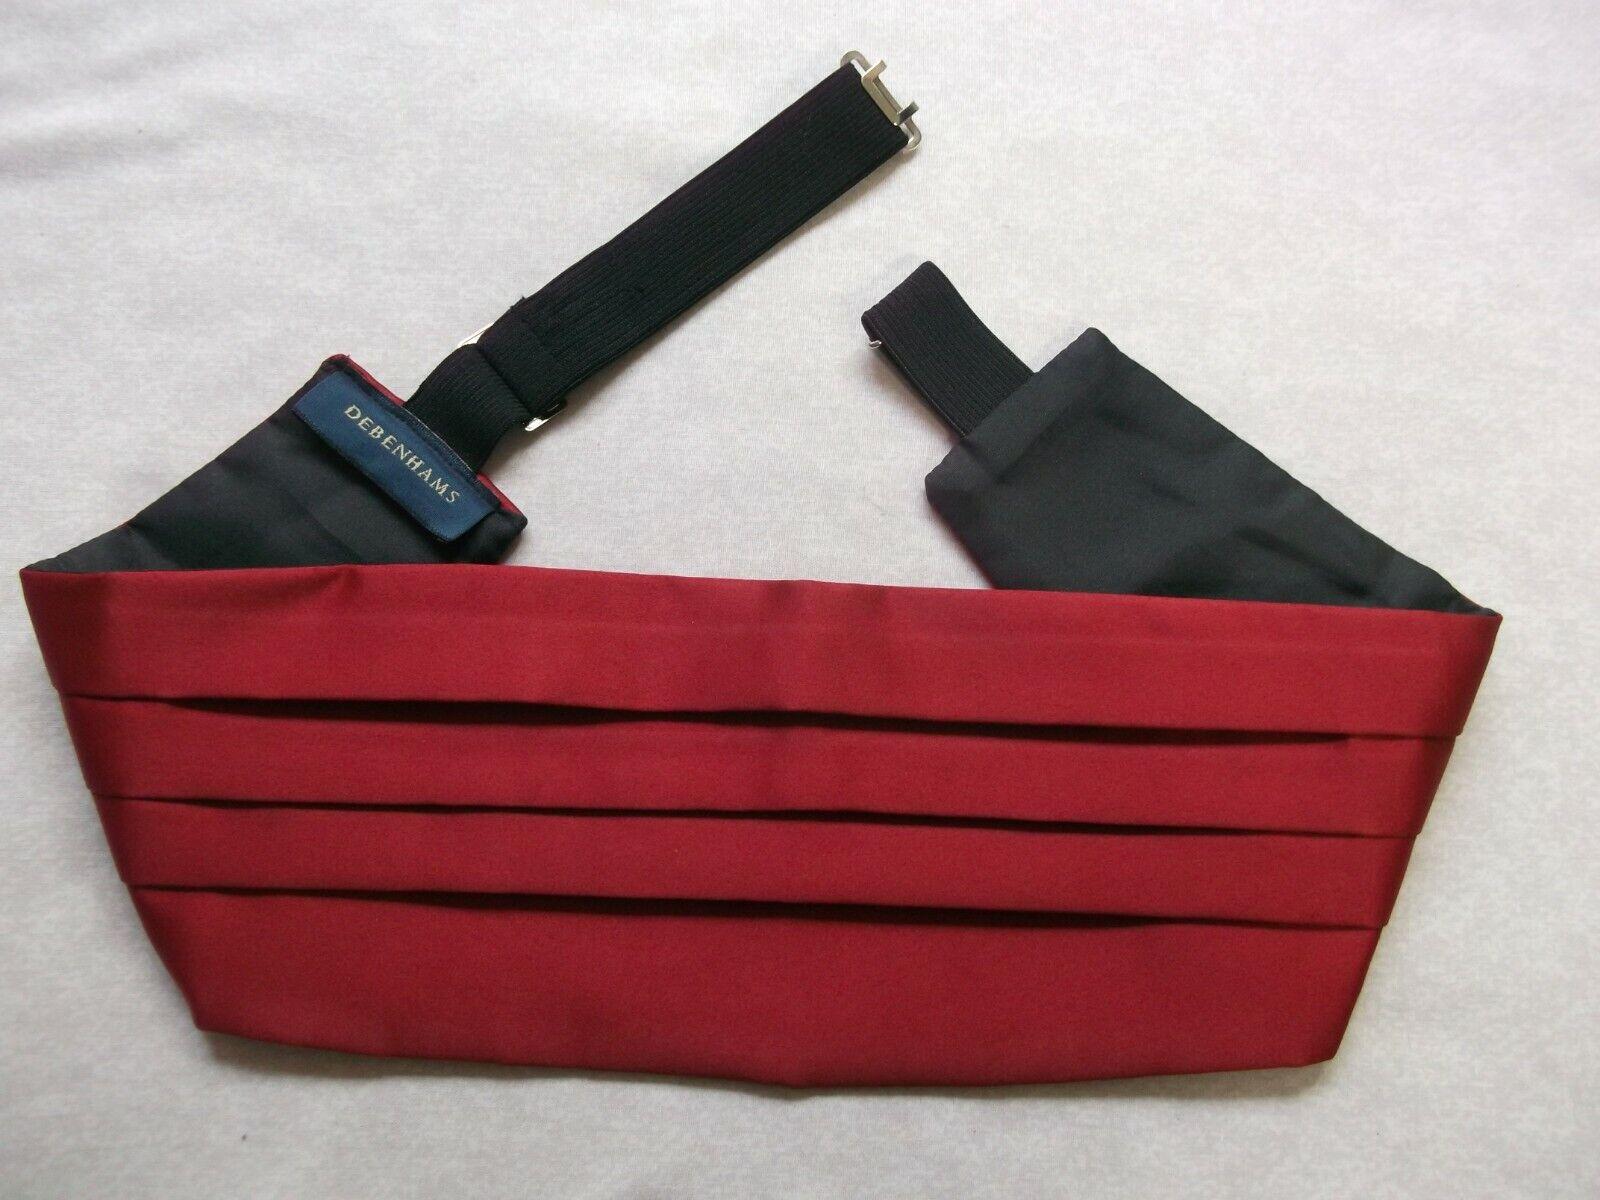 Cummerbund MENS Broad Sash Adjustable PLEATED Dark Red by Debenhams